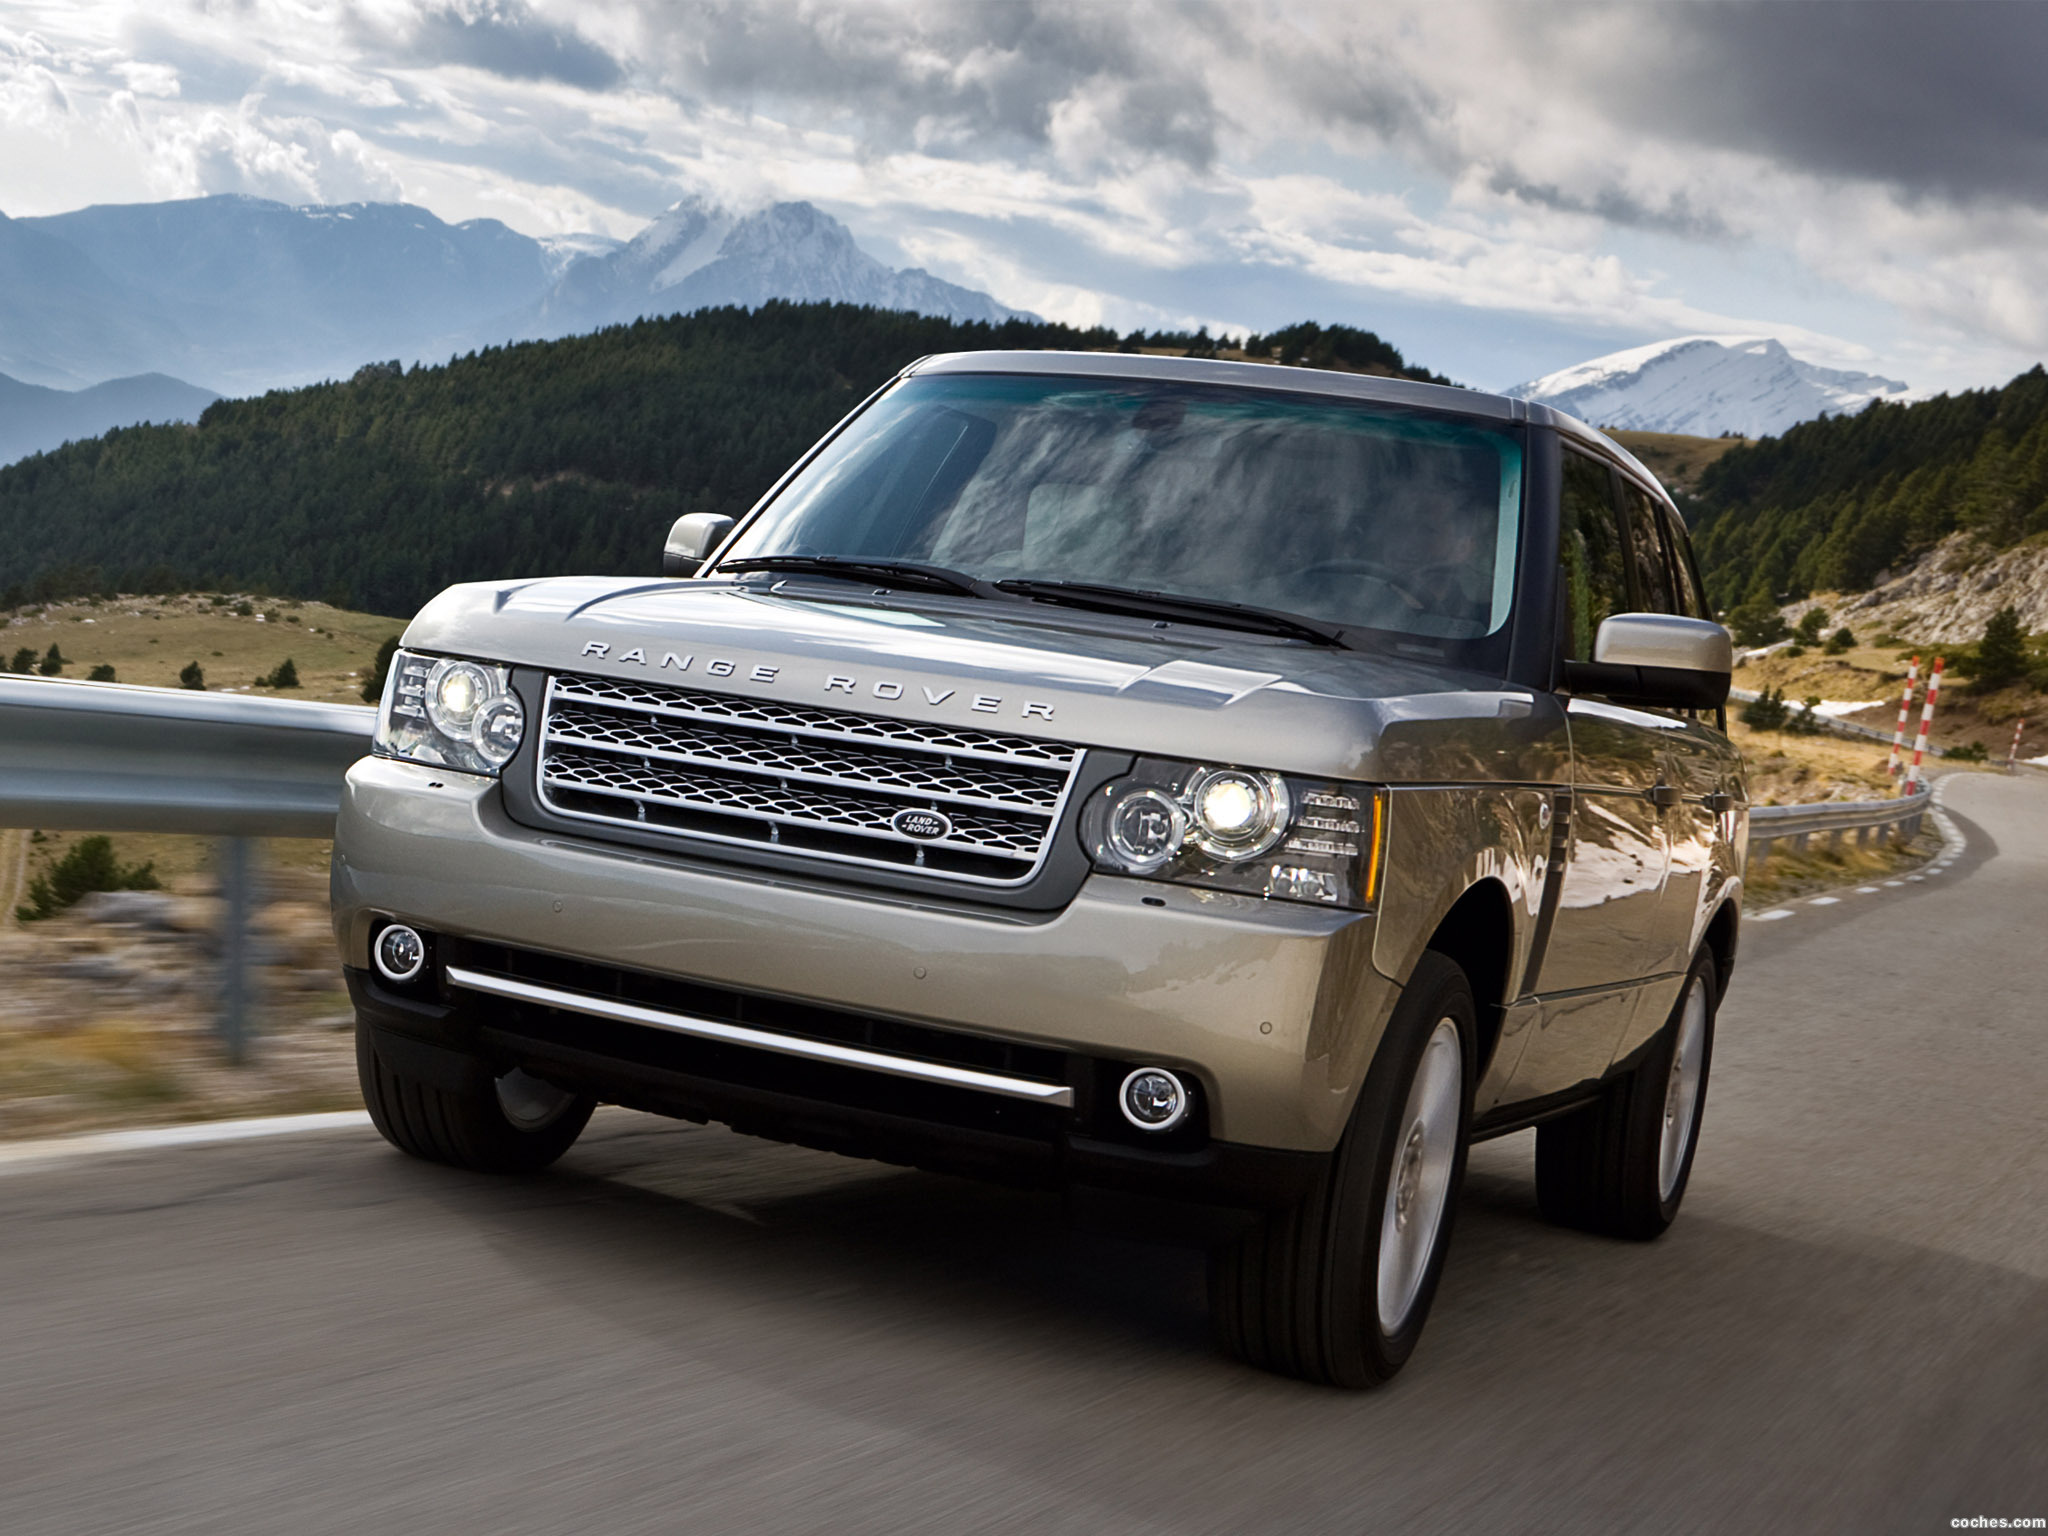 Foto 5 de Land Rover Range Rover (L322) 2009